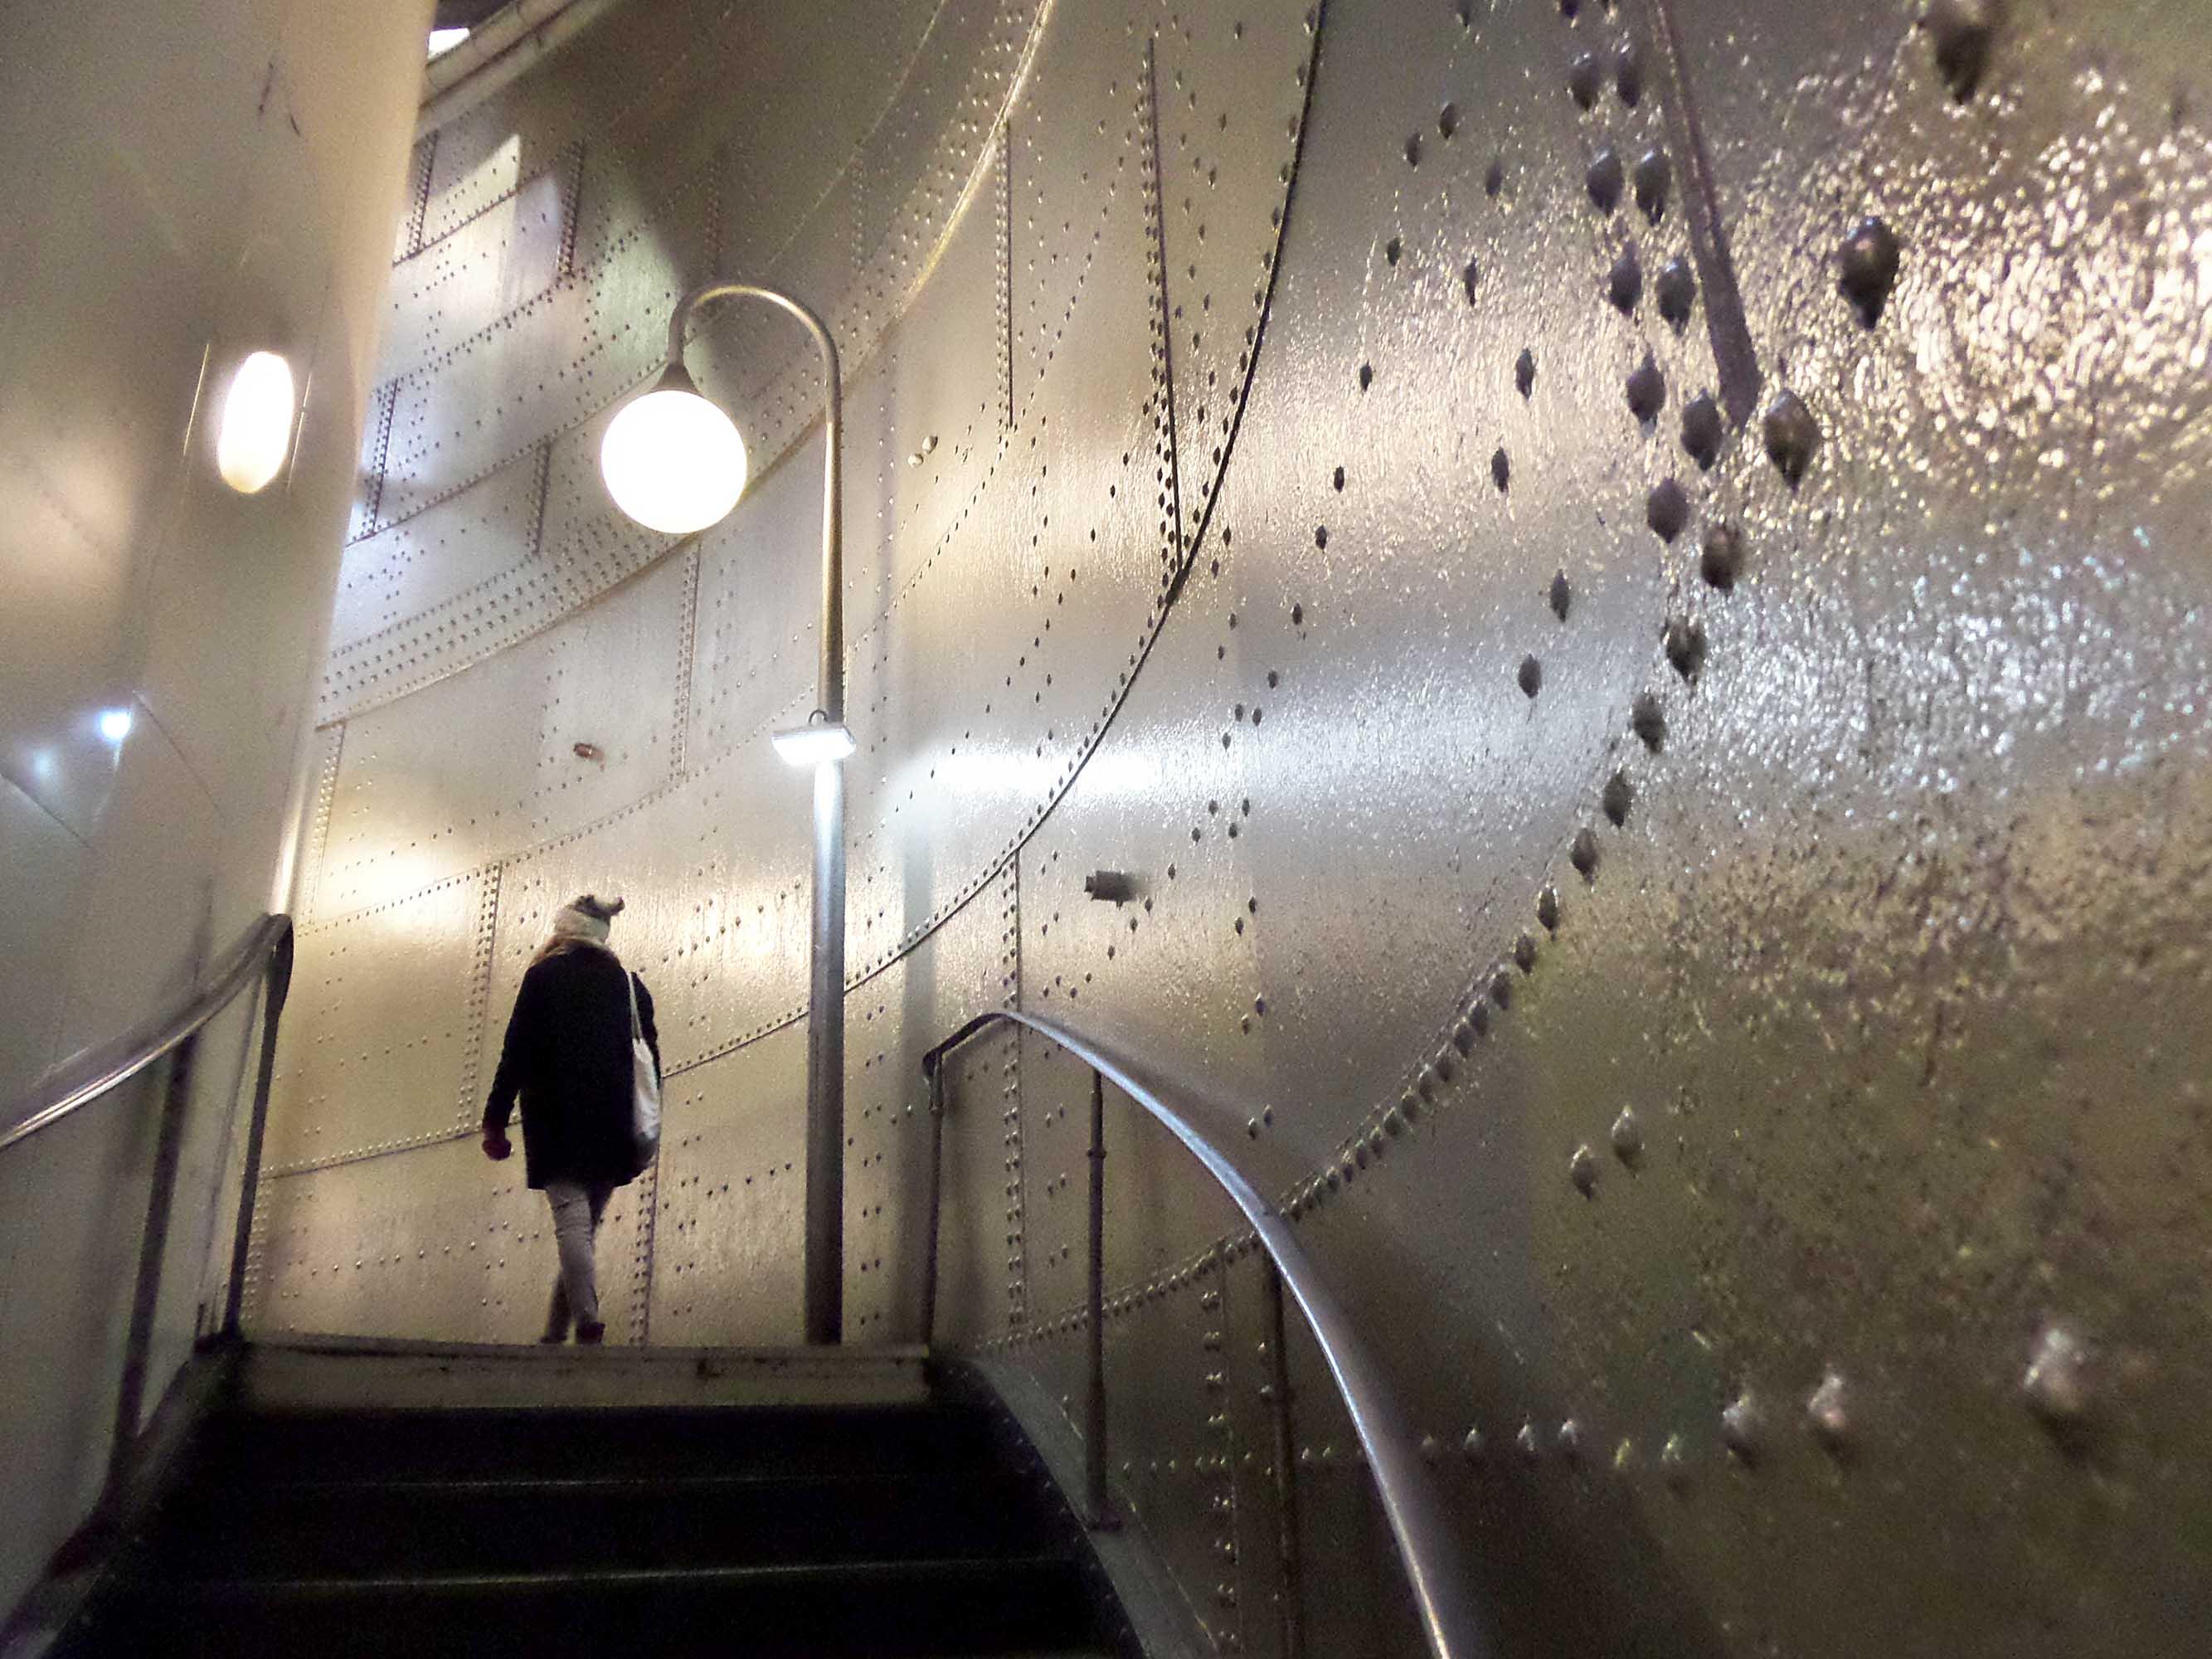 Walking in Paris, copyright: Metterschling 2015